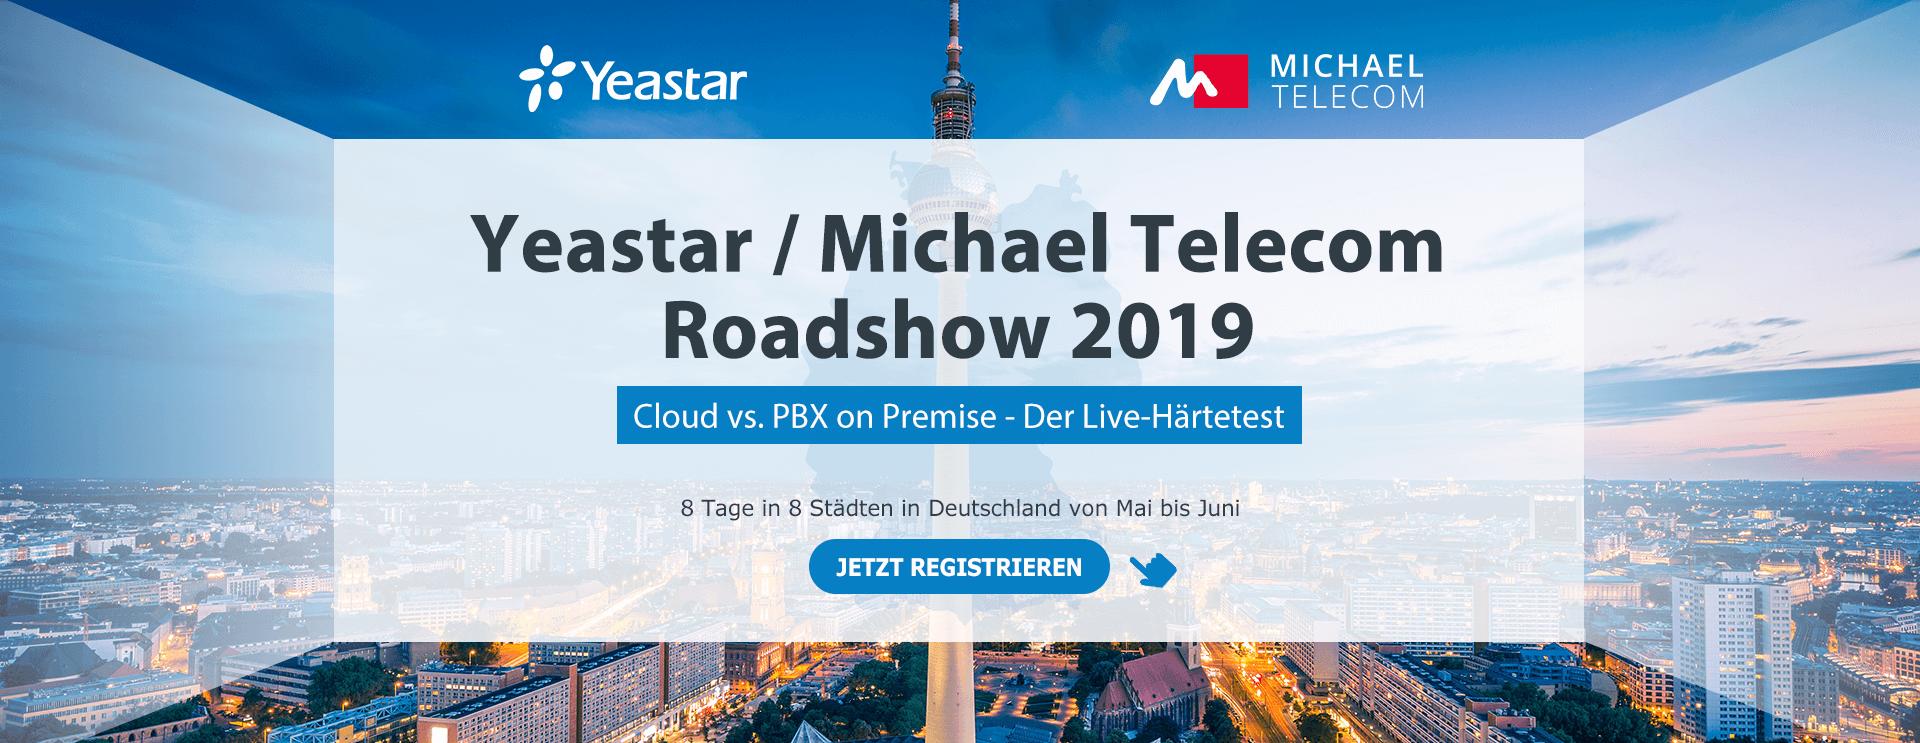 Yeastar Michael Telecom Roadshow 2019 Banner_1